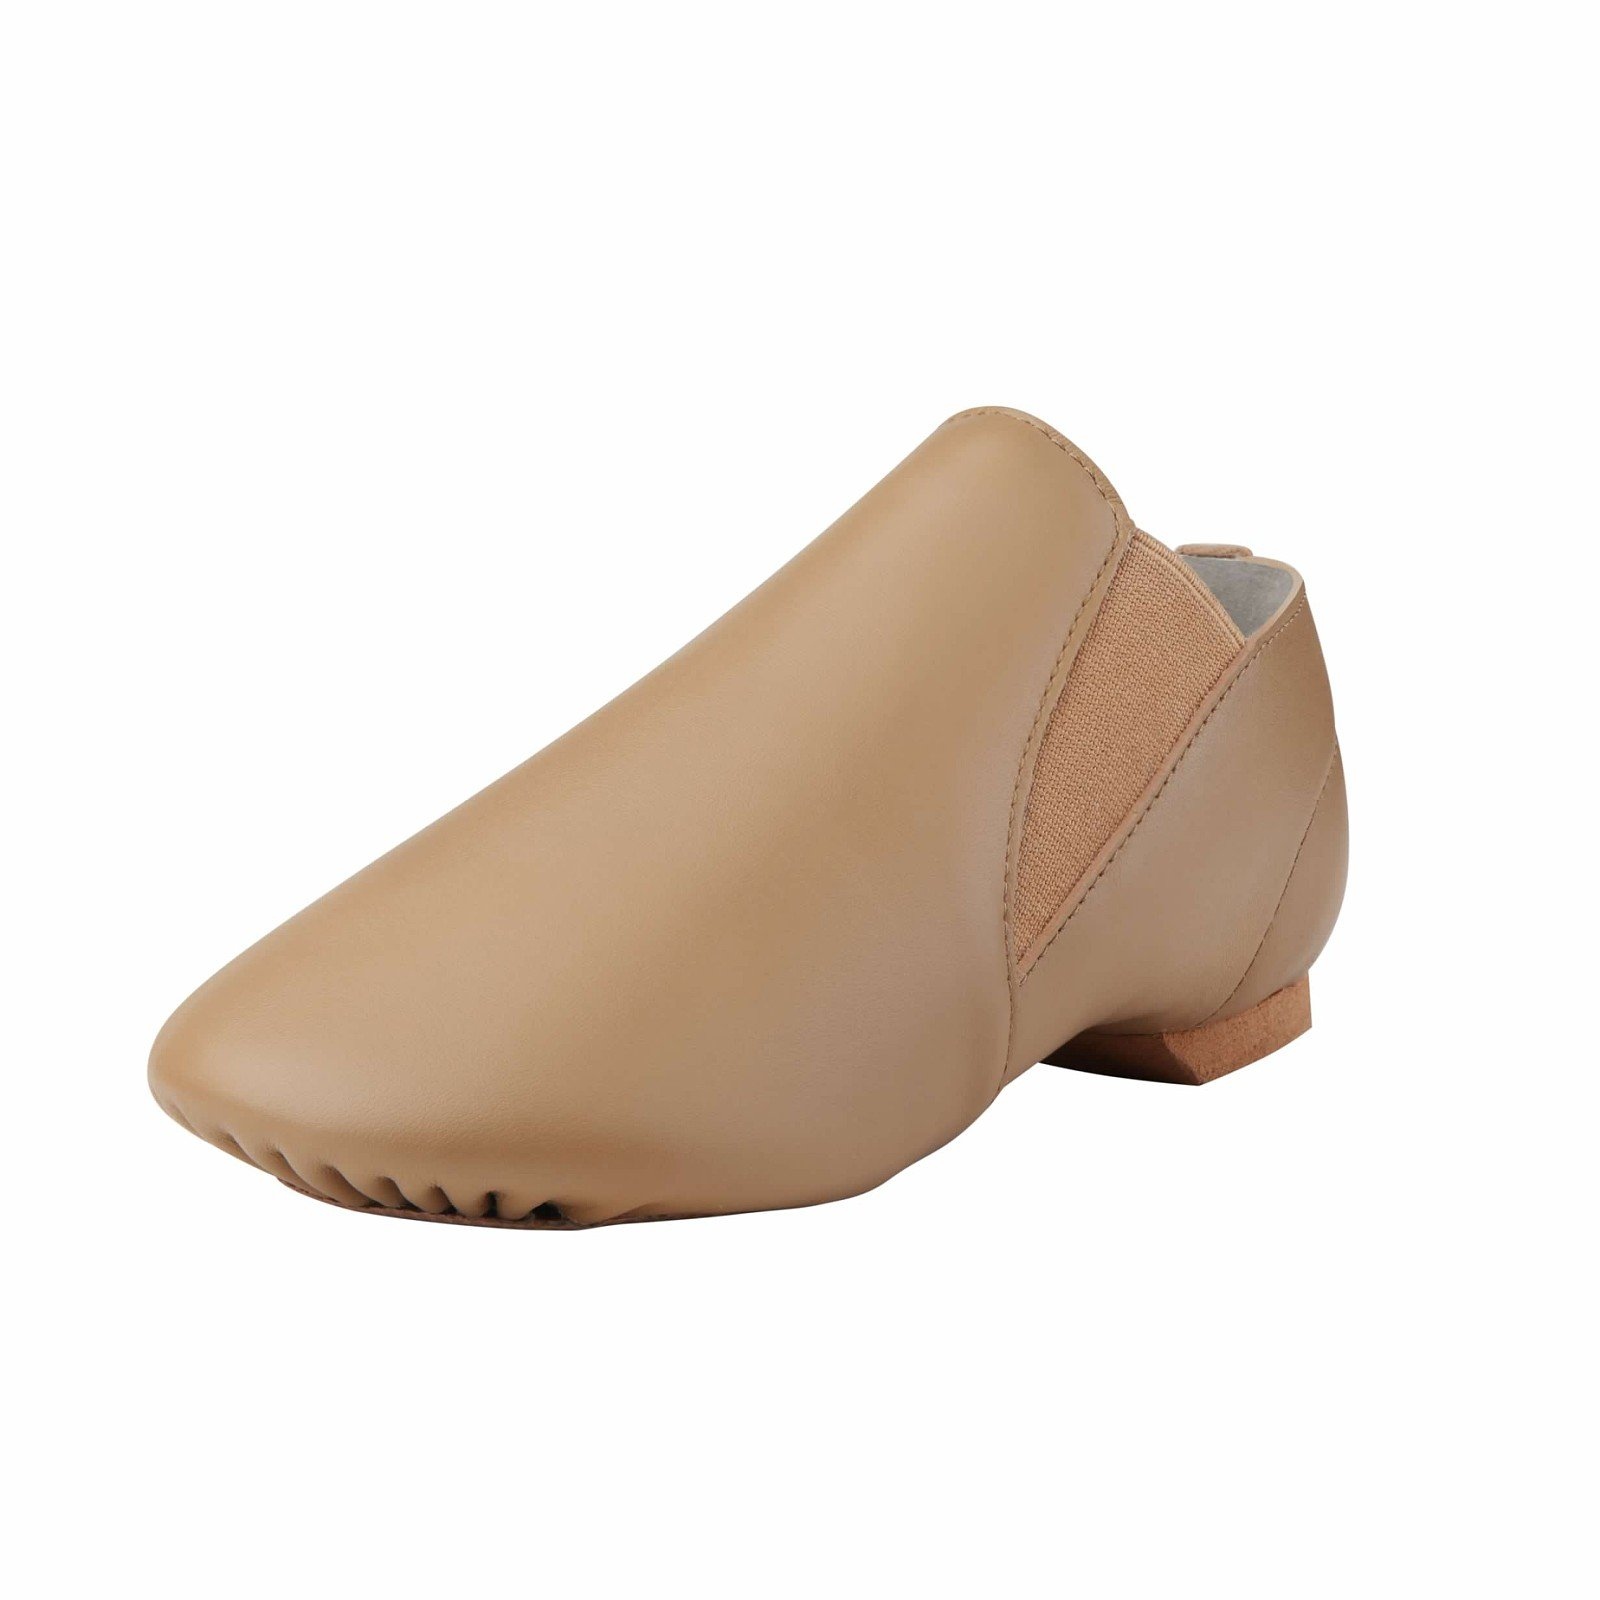 Dynadans Women's Leather Upper Slip-on Jazz Shoe with Elastics Brown 7.5M